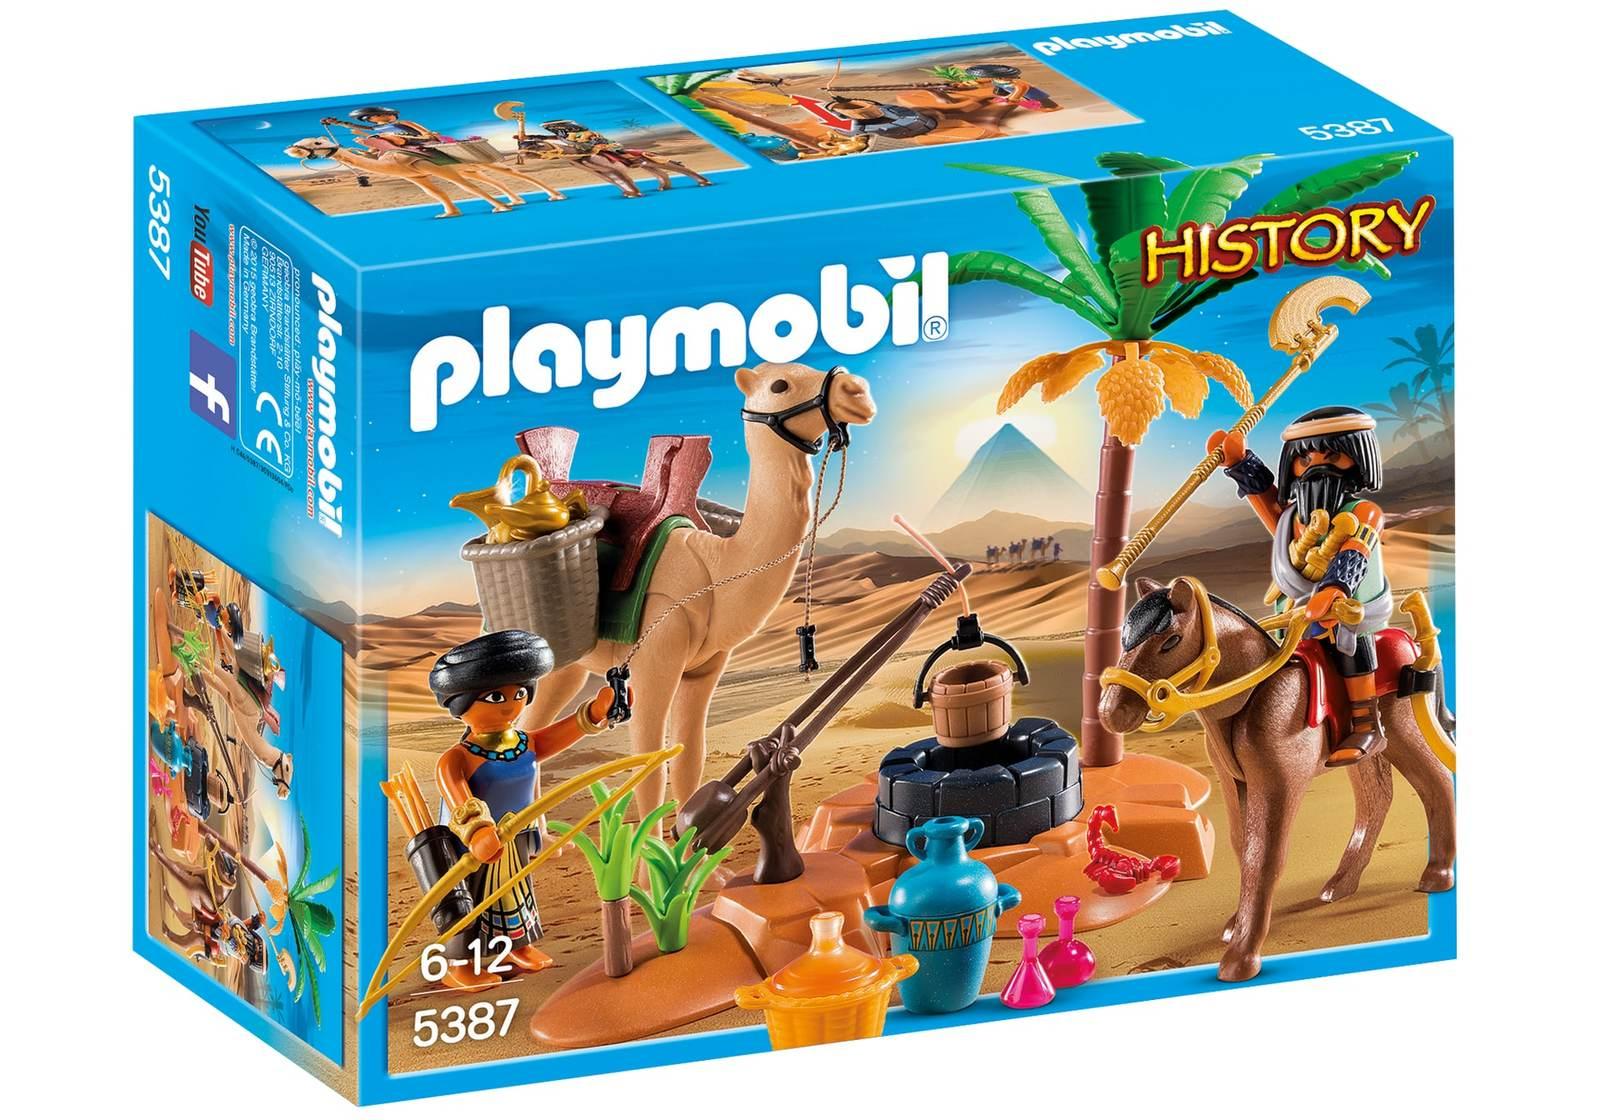 Playmobil: History - Tomb Raiders Camp image